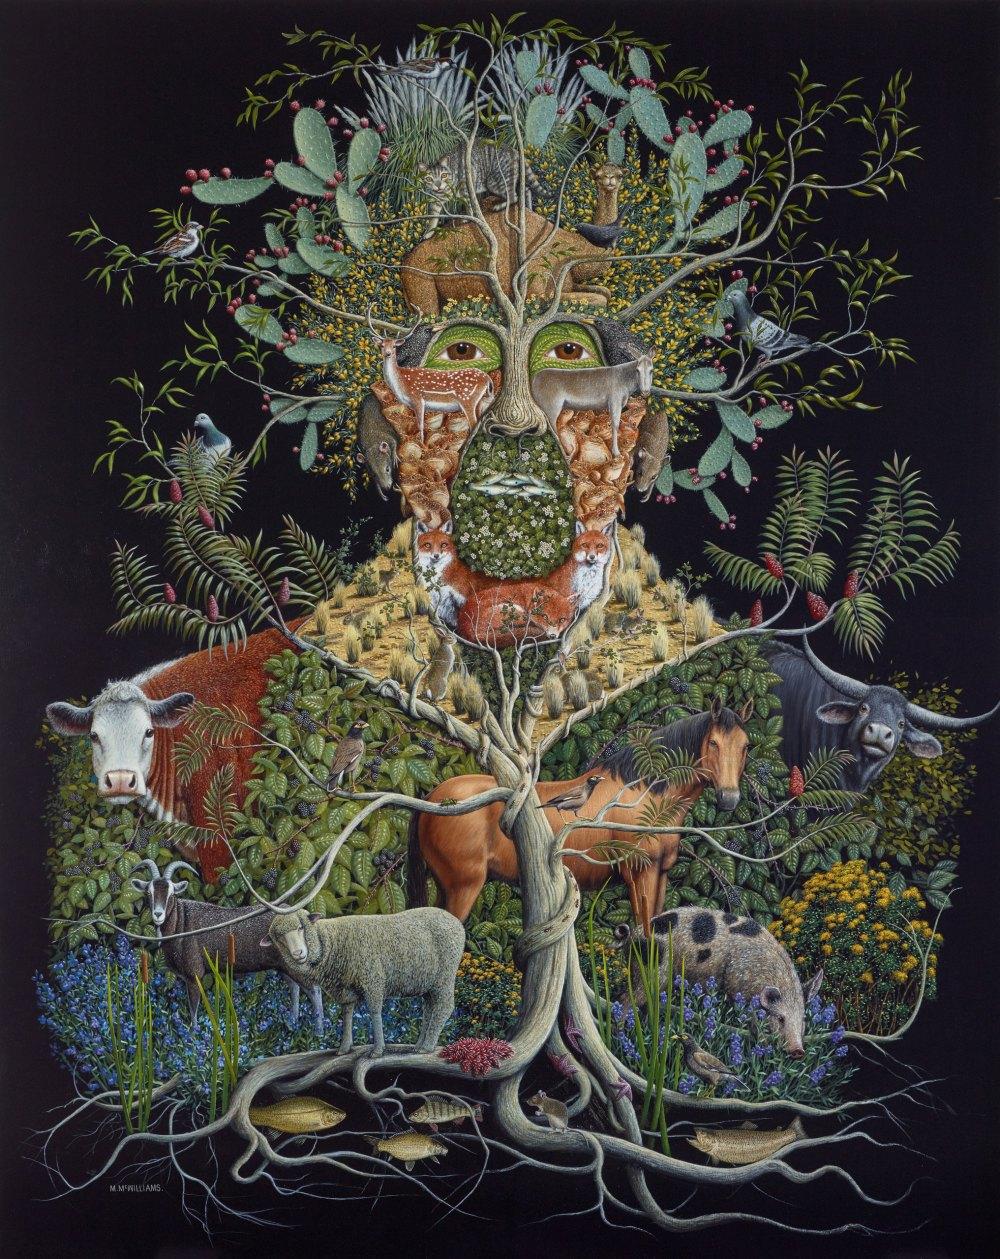 Michael McWilliams - The usurpers (Self-portrait)